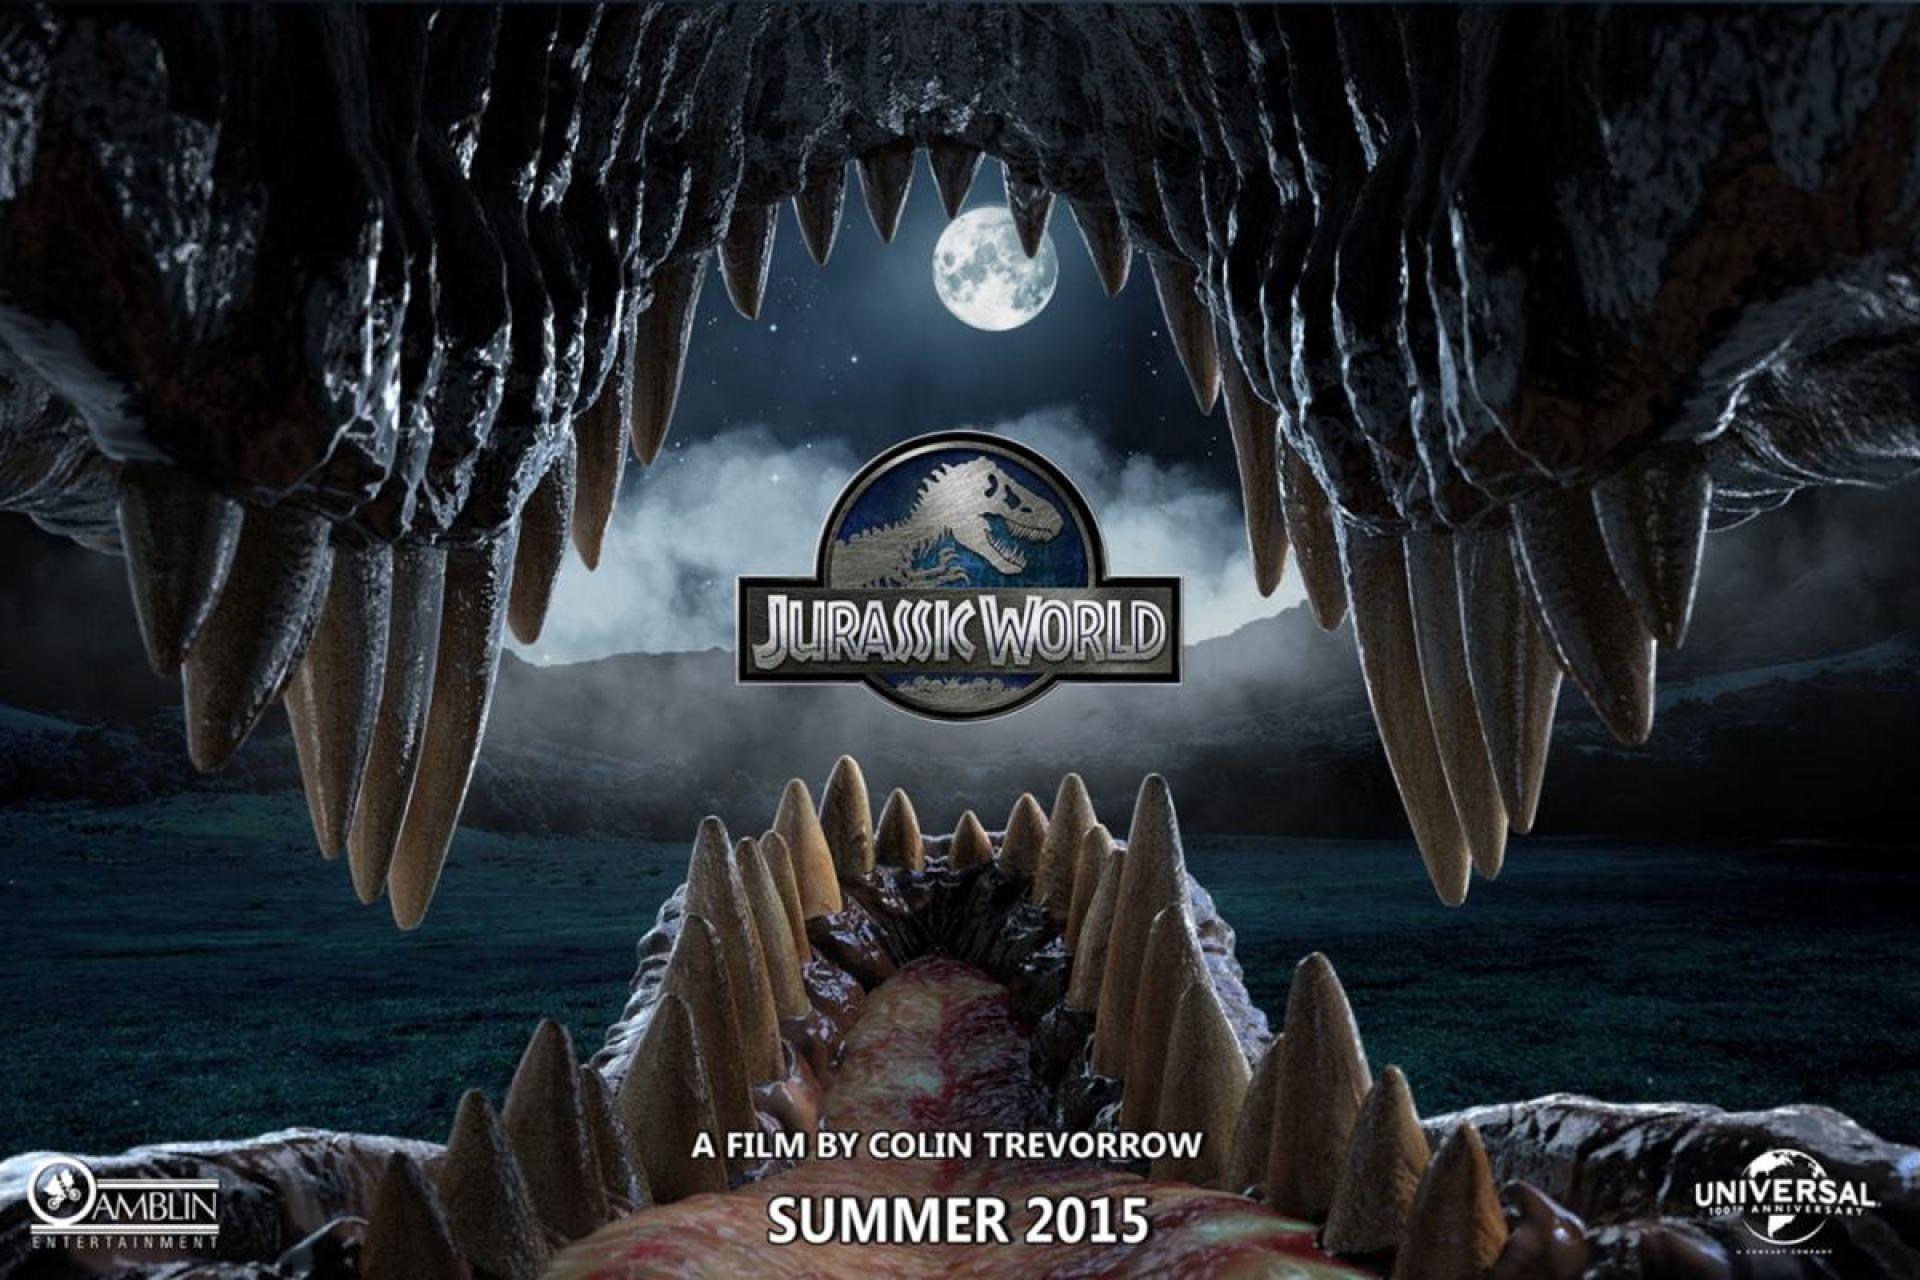 Movie, Jurassic World(美國, 2015) / 侏羅紀世界(台.港) / 侏罗纪世界(中), 電影海報, 美國